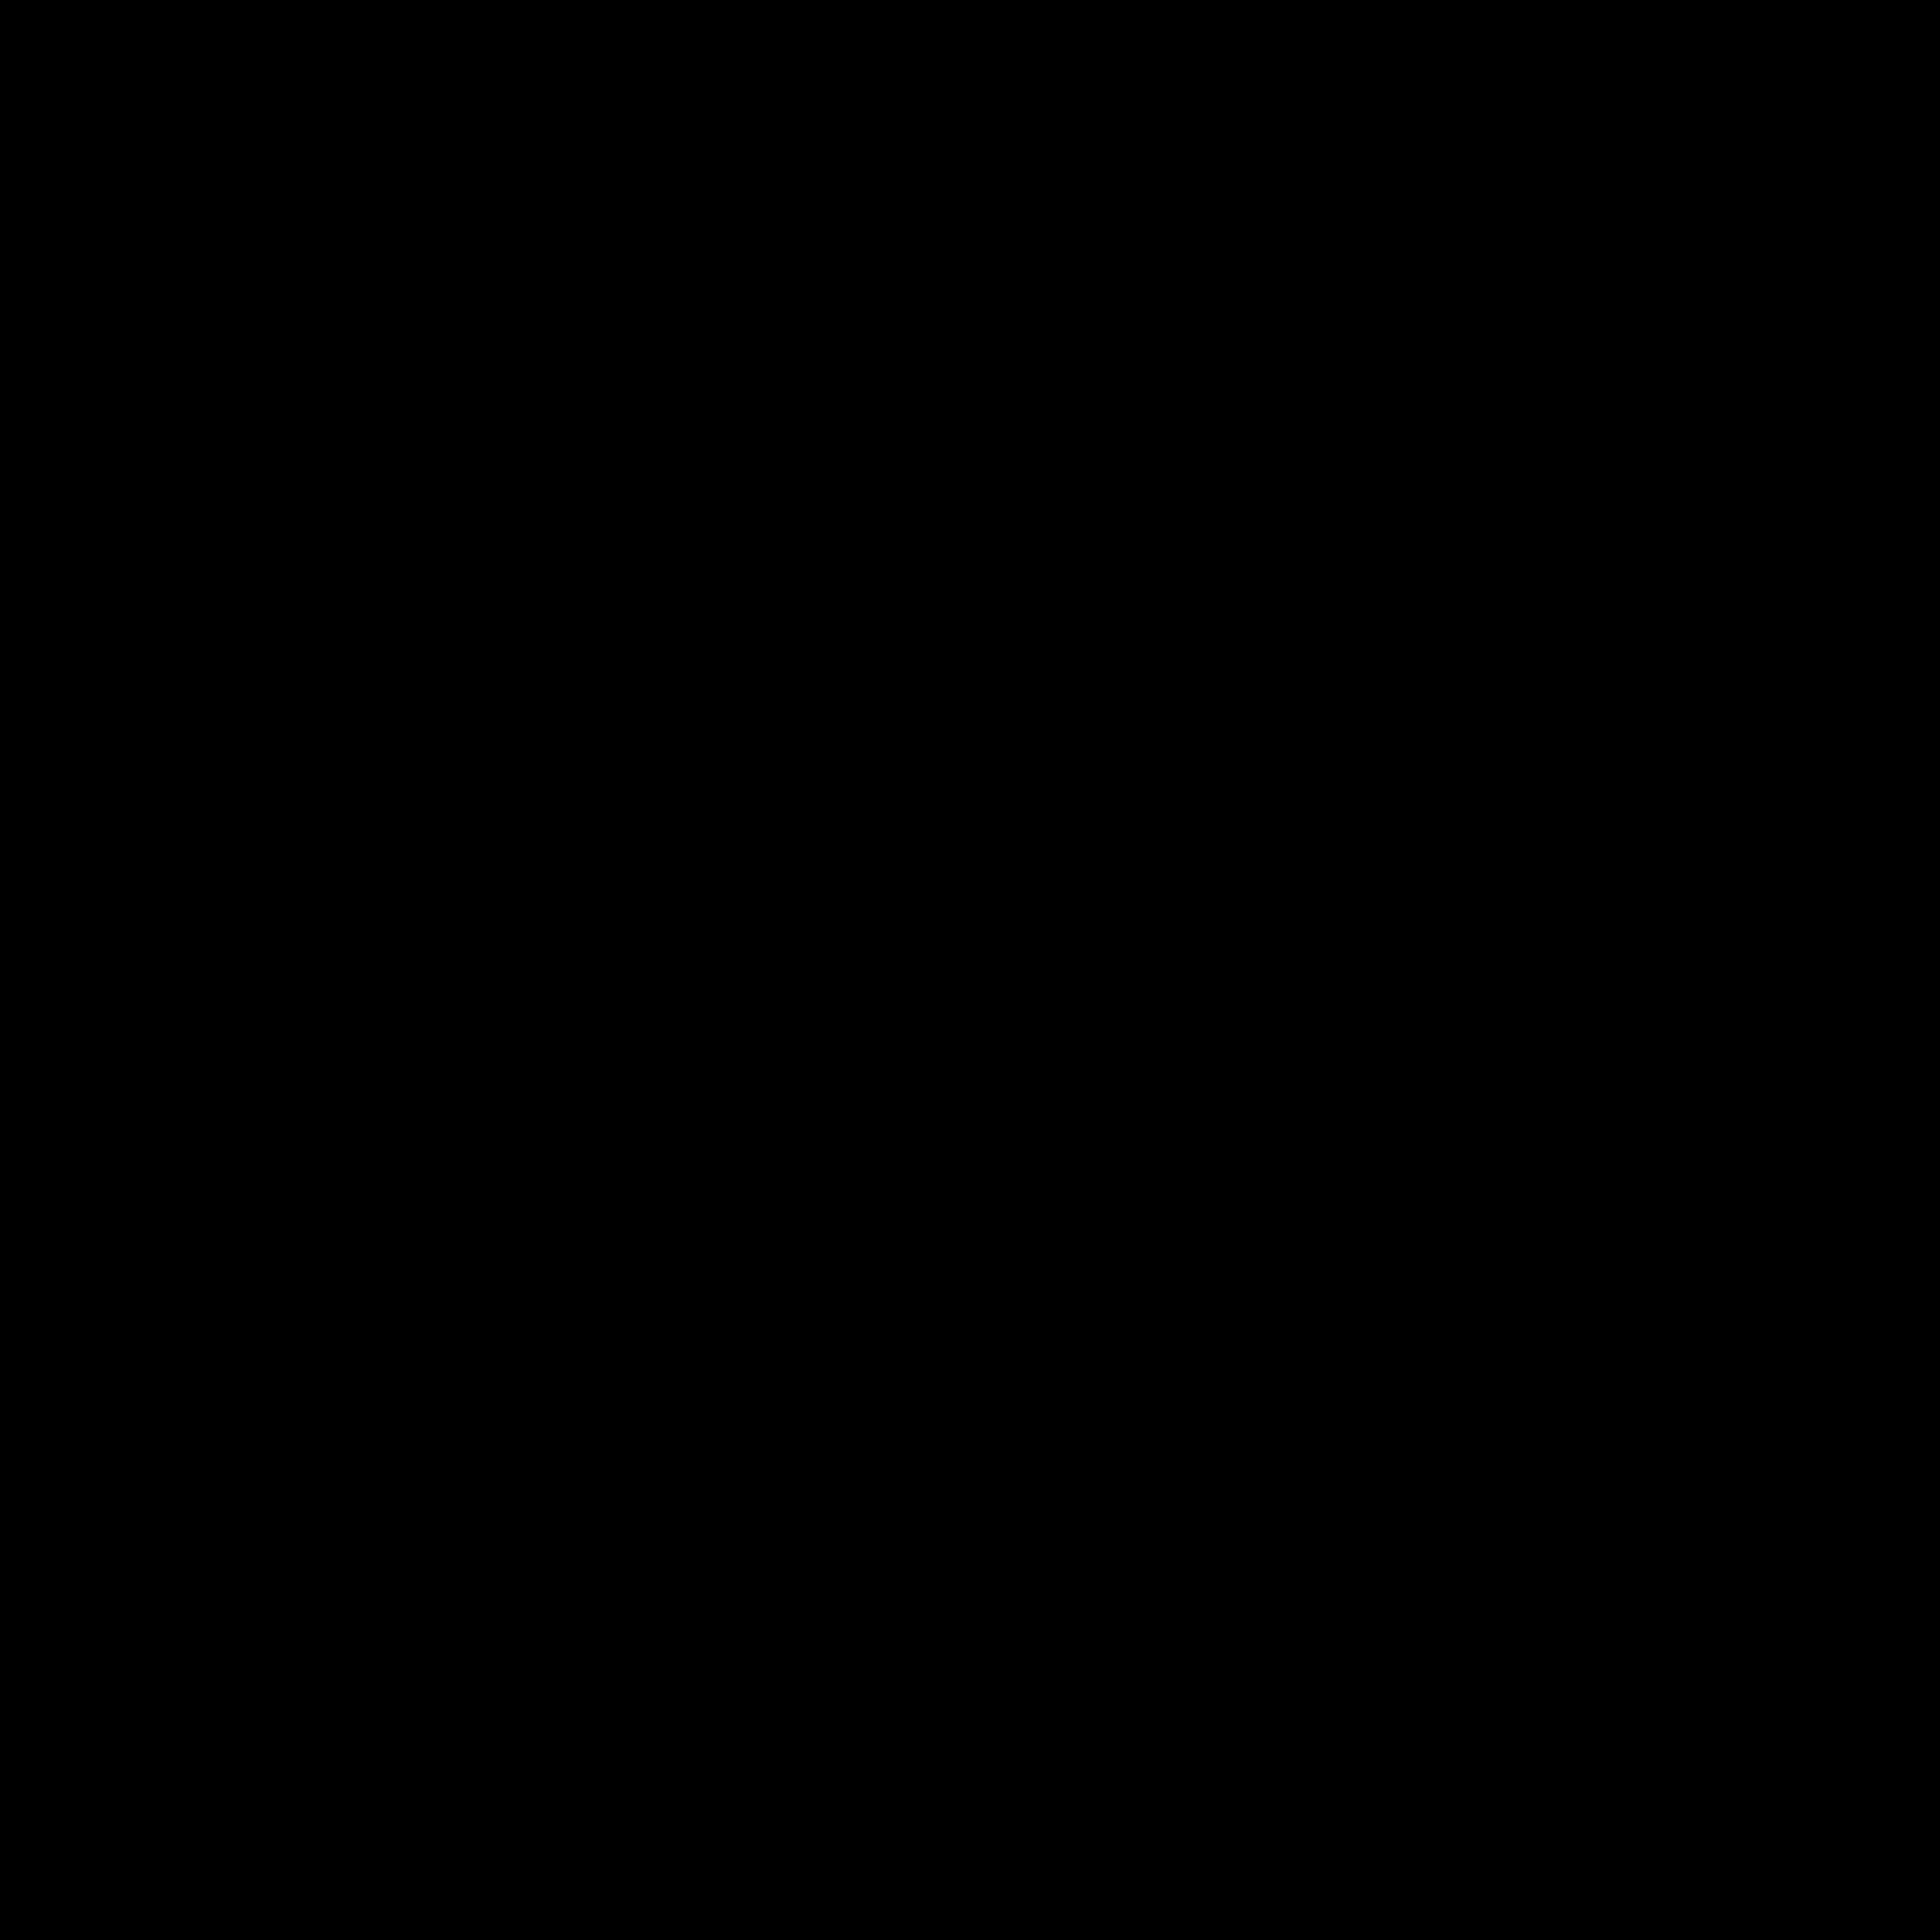 Cisco Systems 1200 Logo PNG Transparent & SVG Vector.